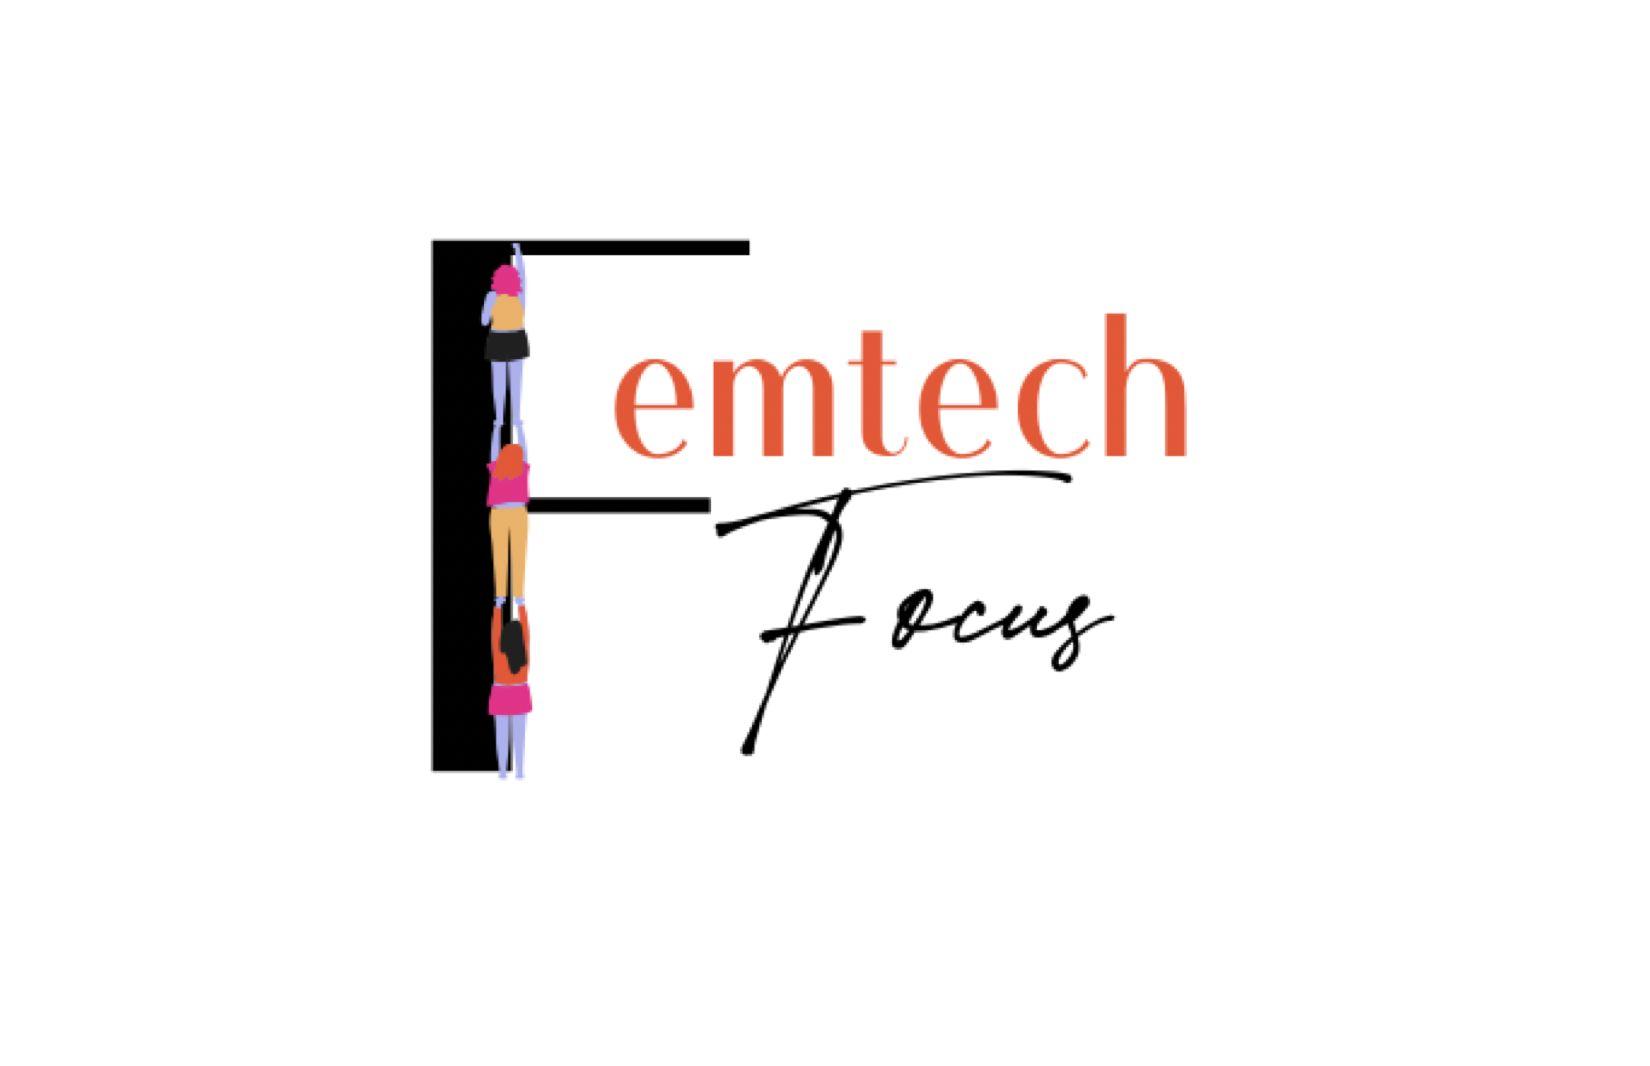 FemTech Focus - Femtech in Japan with Fermata -Episode 10